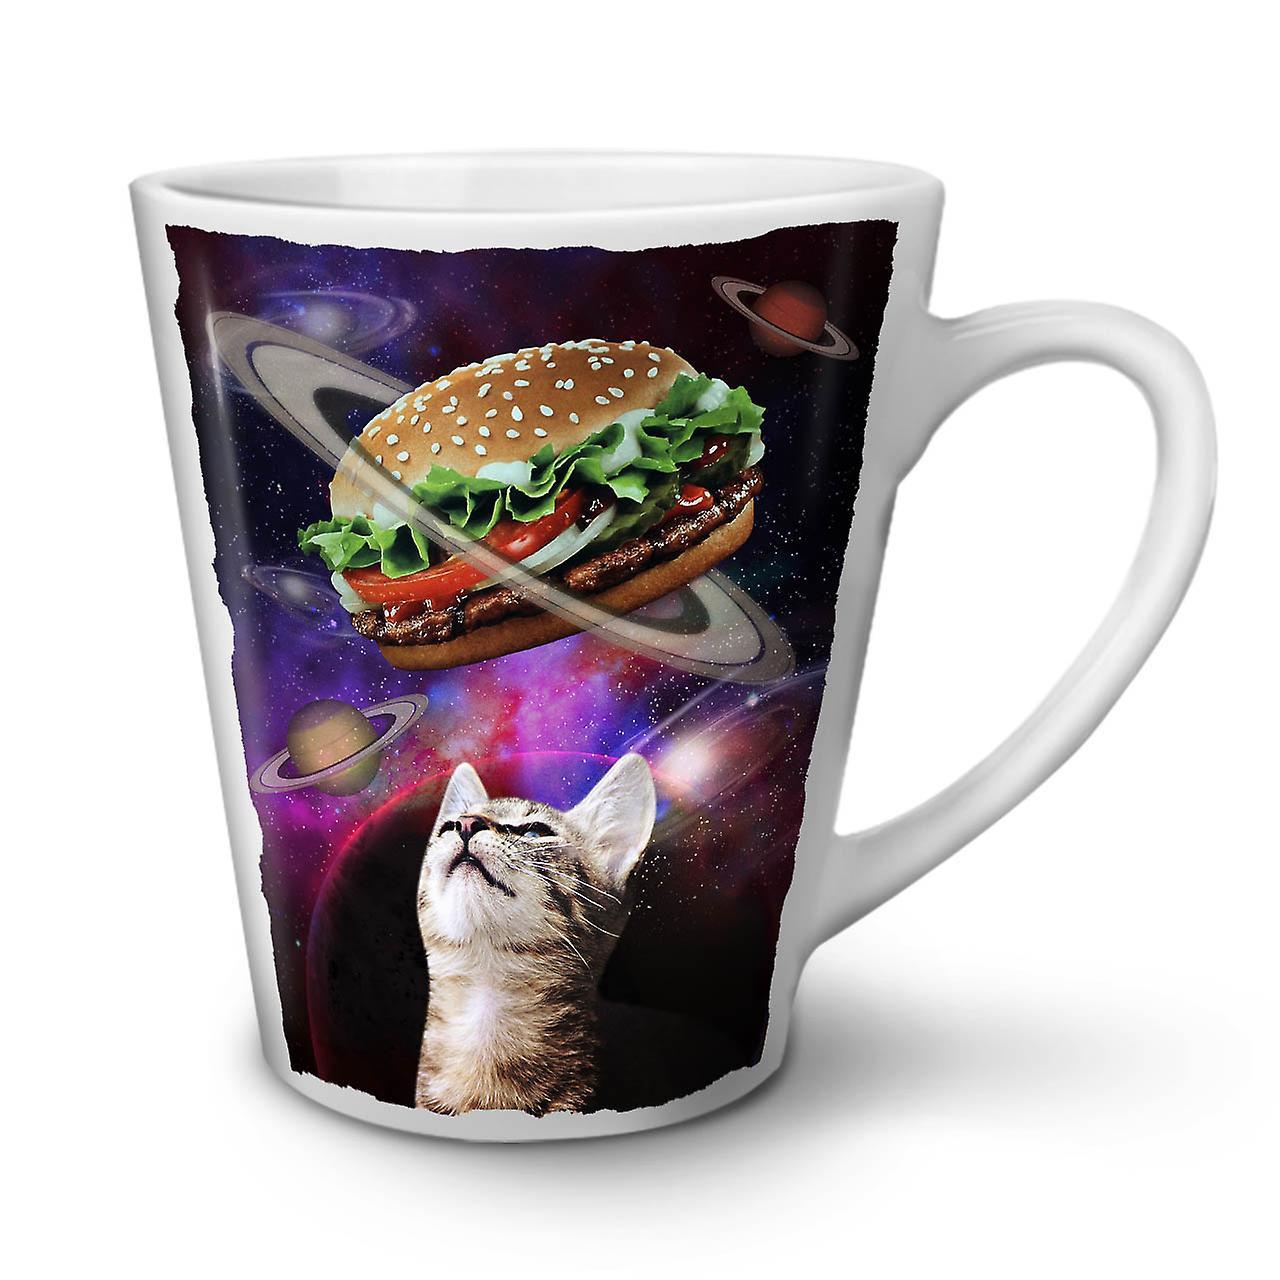 Chat Fun Céramique Burger Tasse Blanche 12 Café OzWellcoda Nouvelle Space En Latte xdCoEBrWQe